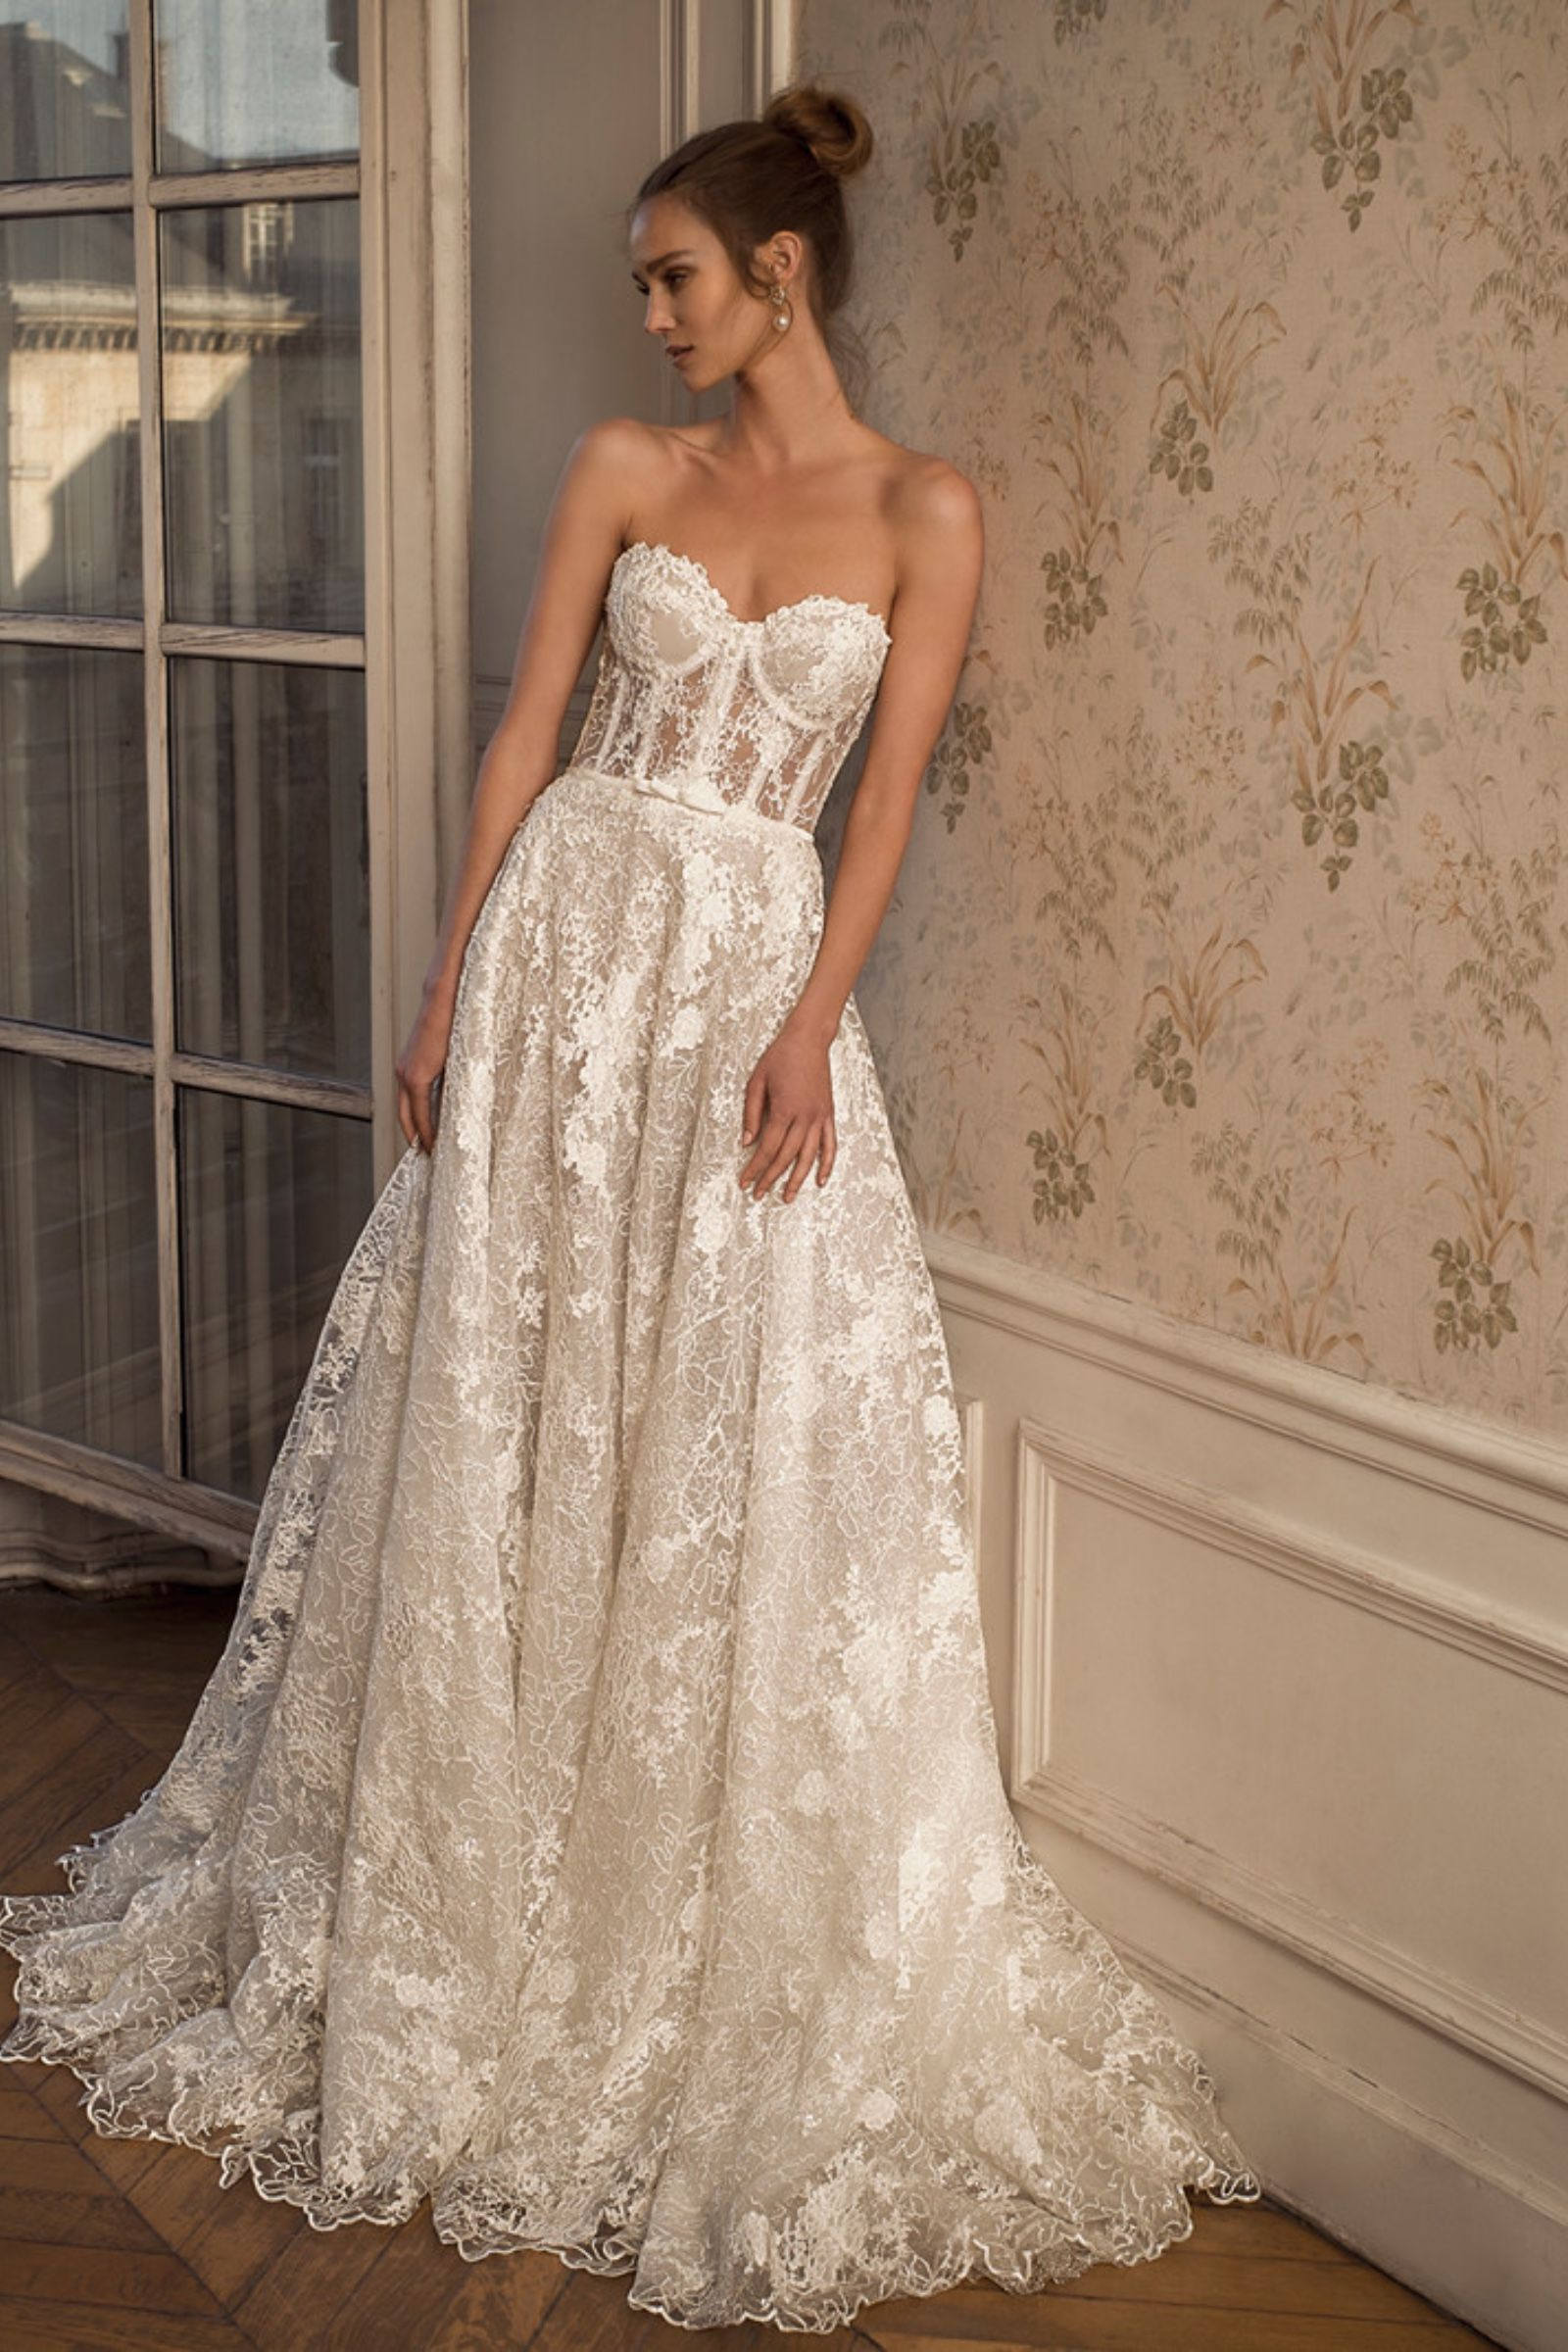 Netta Benshabu Bridal Symon Haute Couture Kinsley James